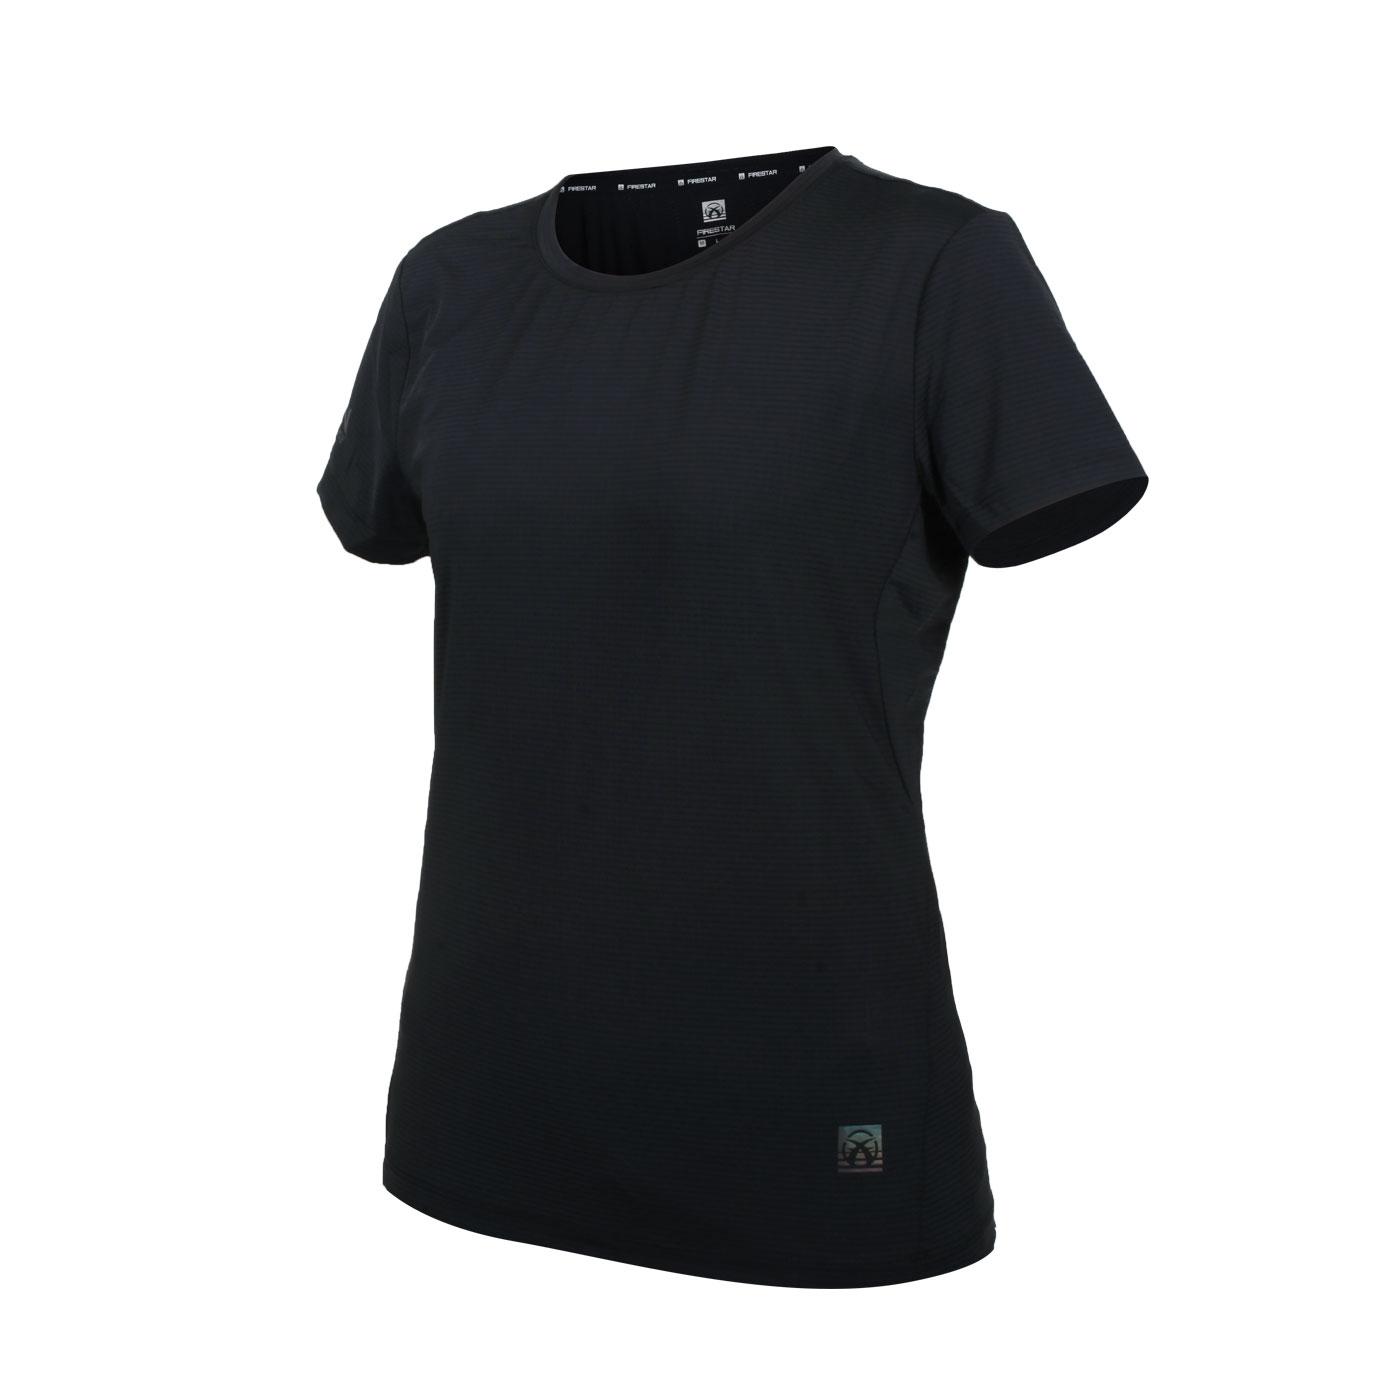 FIRESTAR 女款彈性機能圓領短袖T恤 DL161-10 - 黑